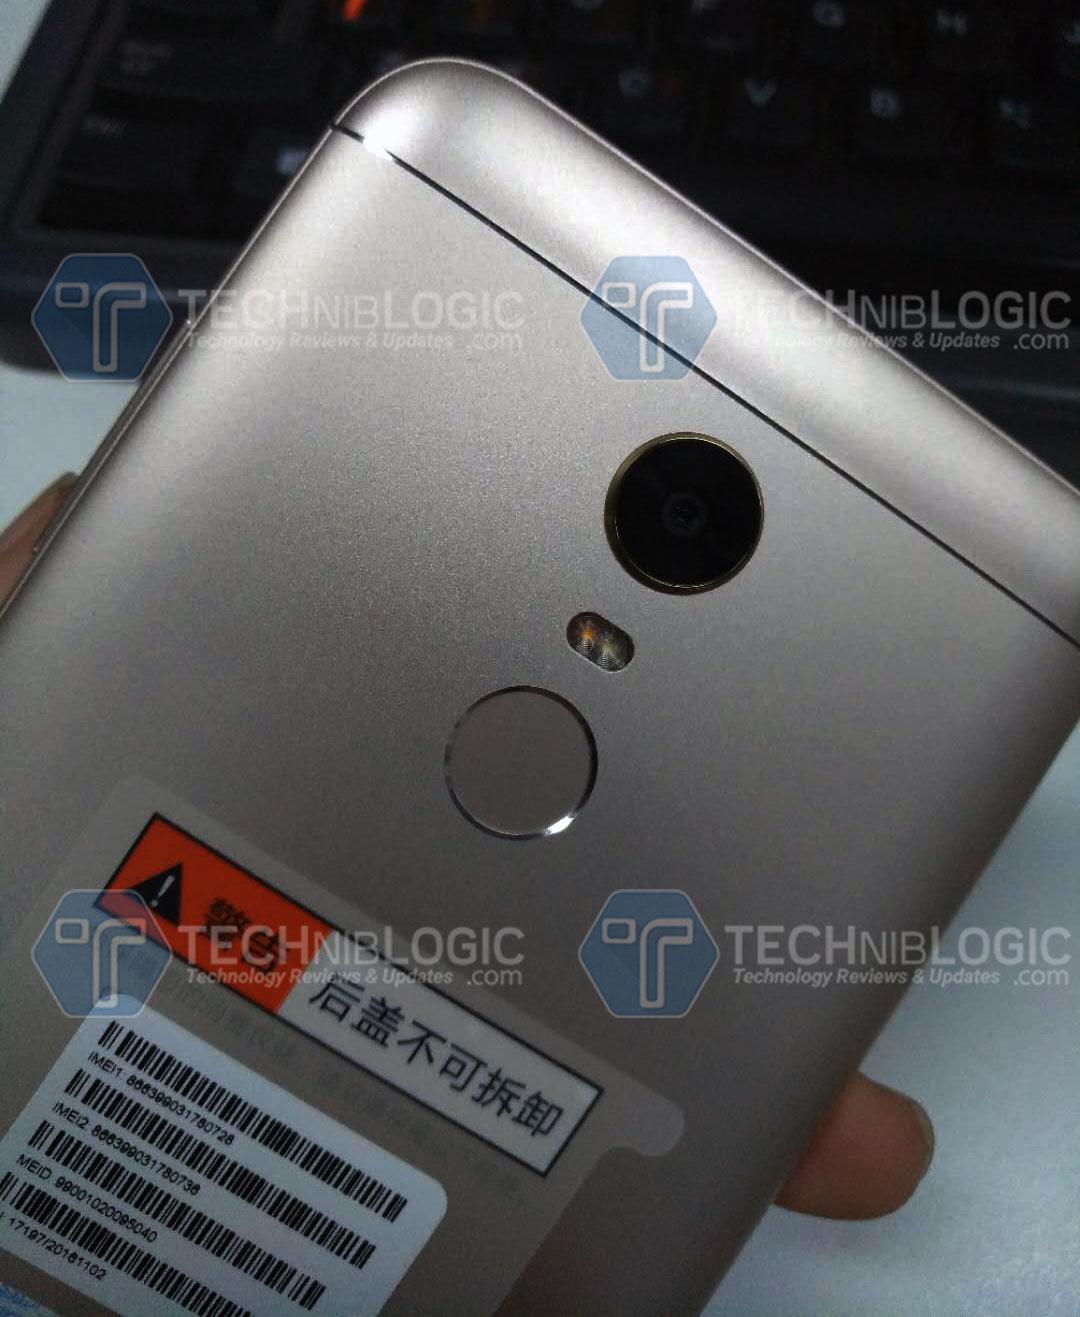 Xiaomi Redmi 5 Plus price, specifications, features Explained 4